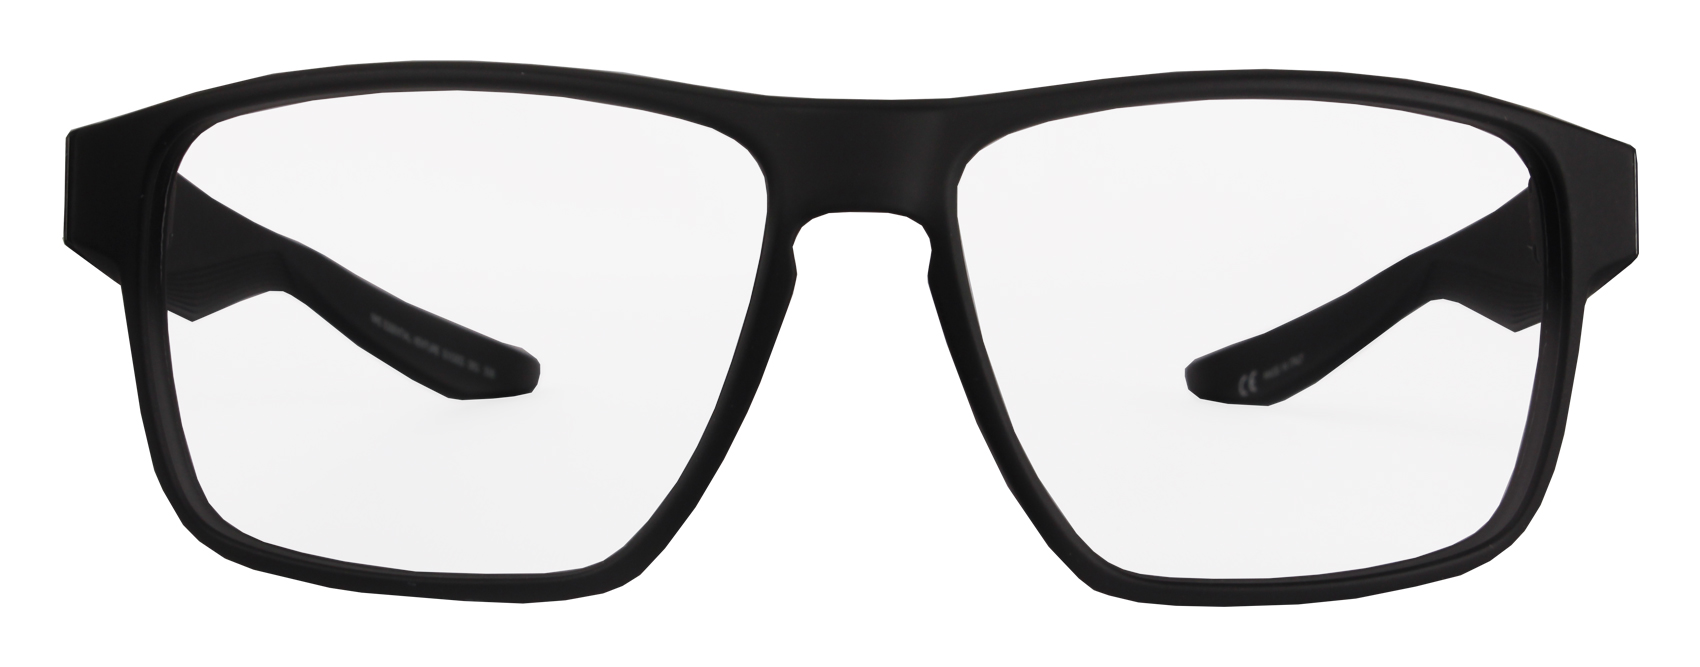 Nike Venture Lead Glasses Front